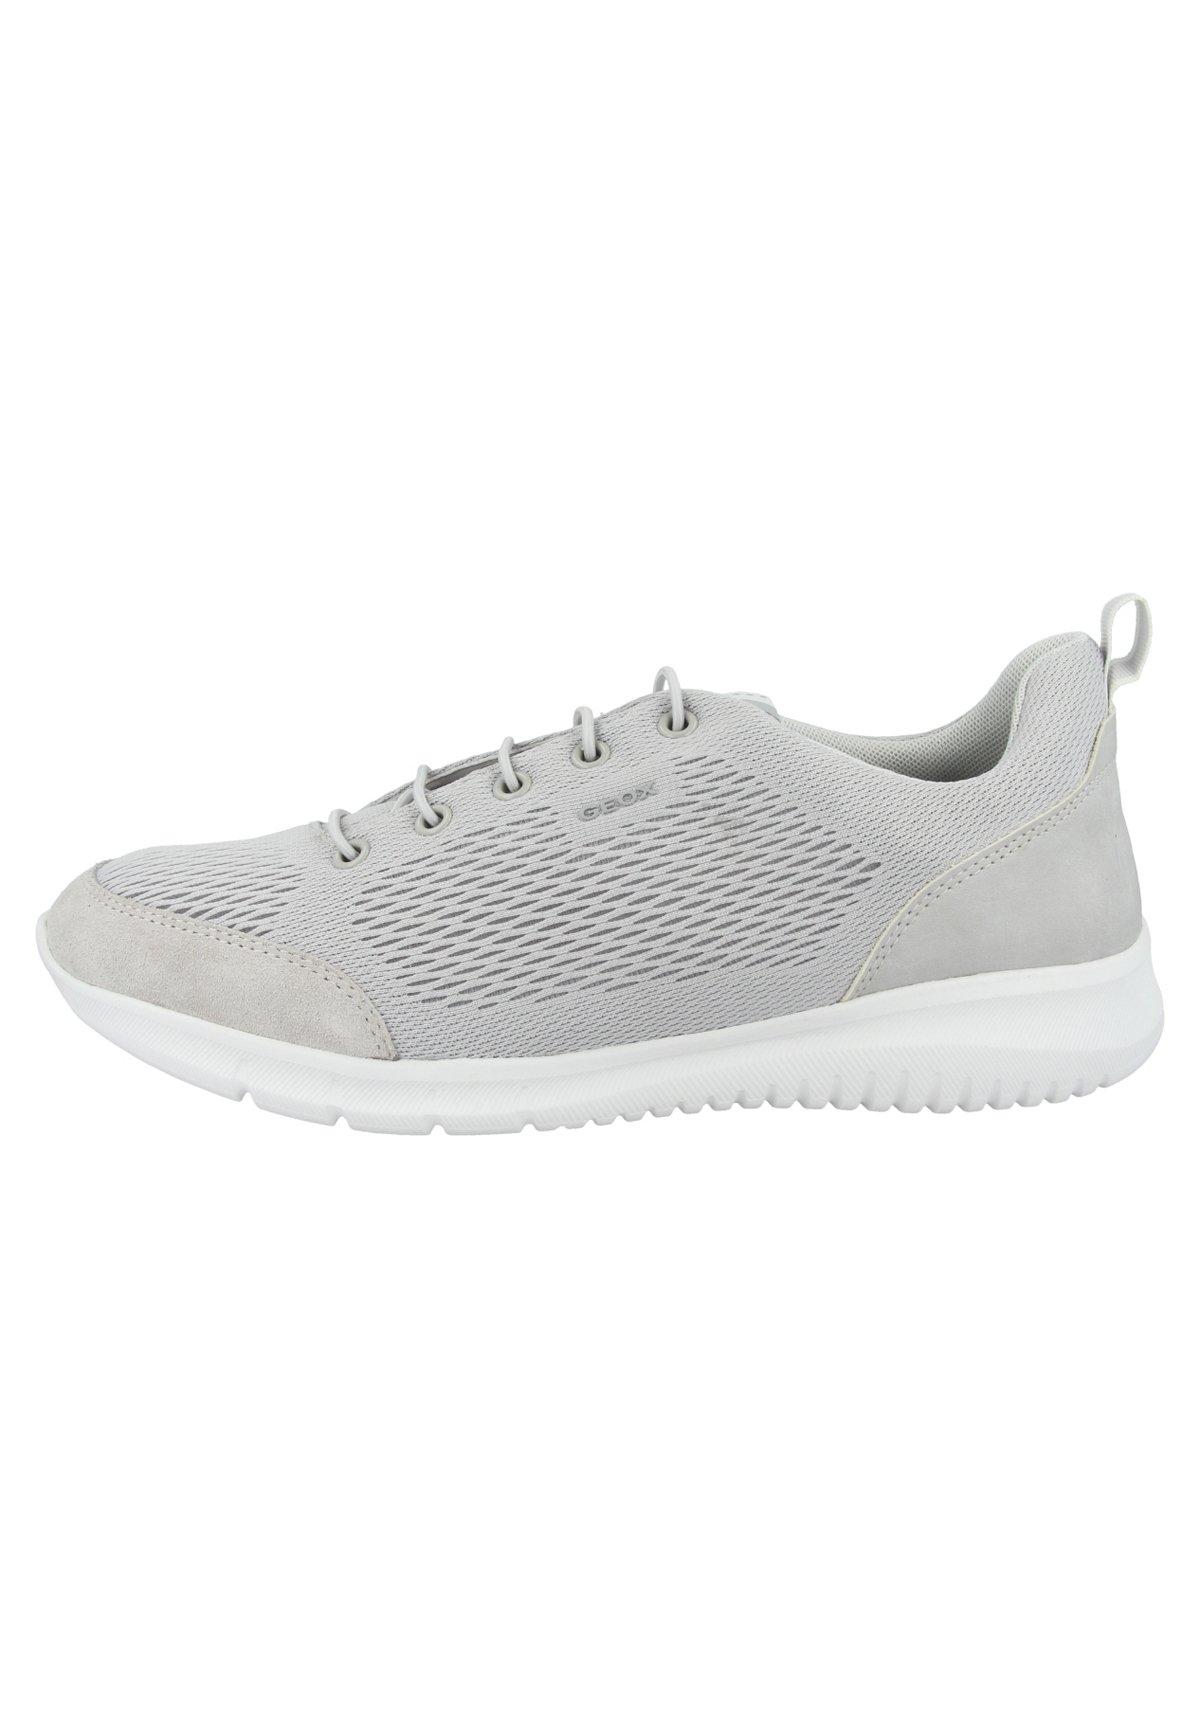 Homme MONREALE - Baskets basses - light grey